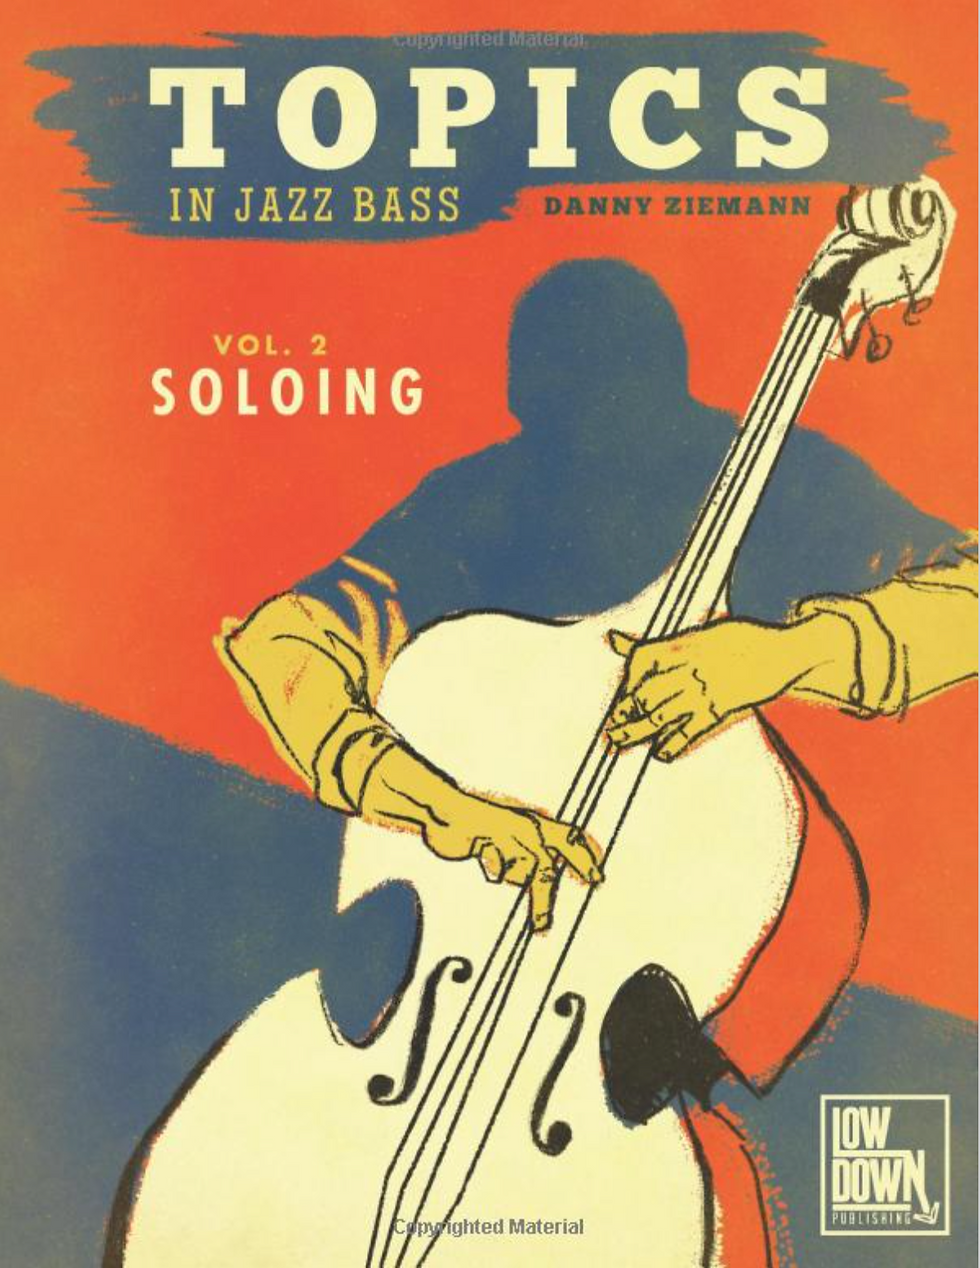 TOPICS In Jazz Bass Vol 2